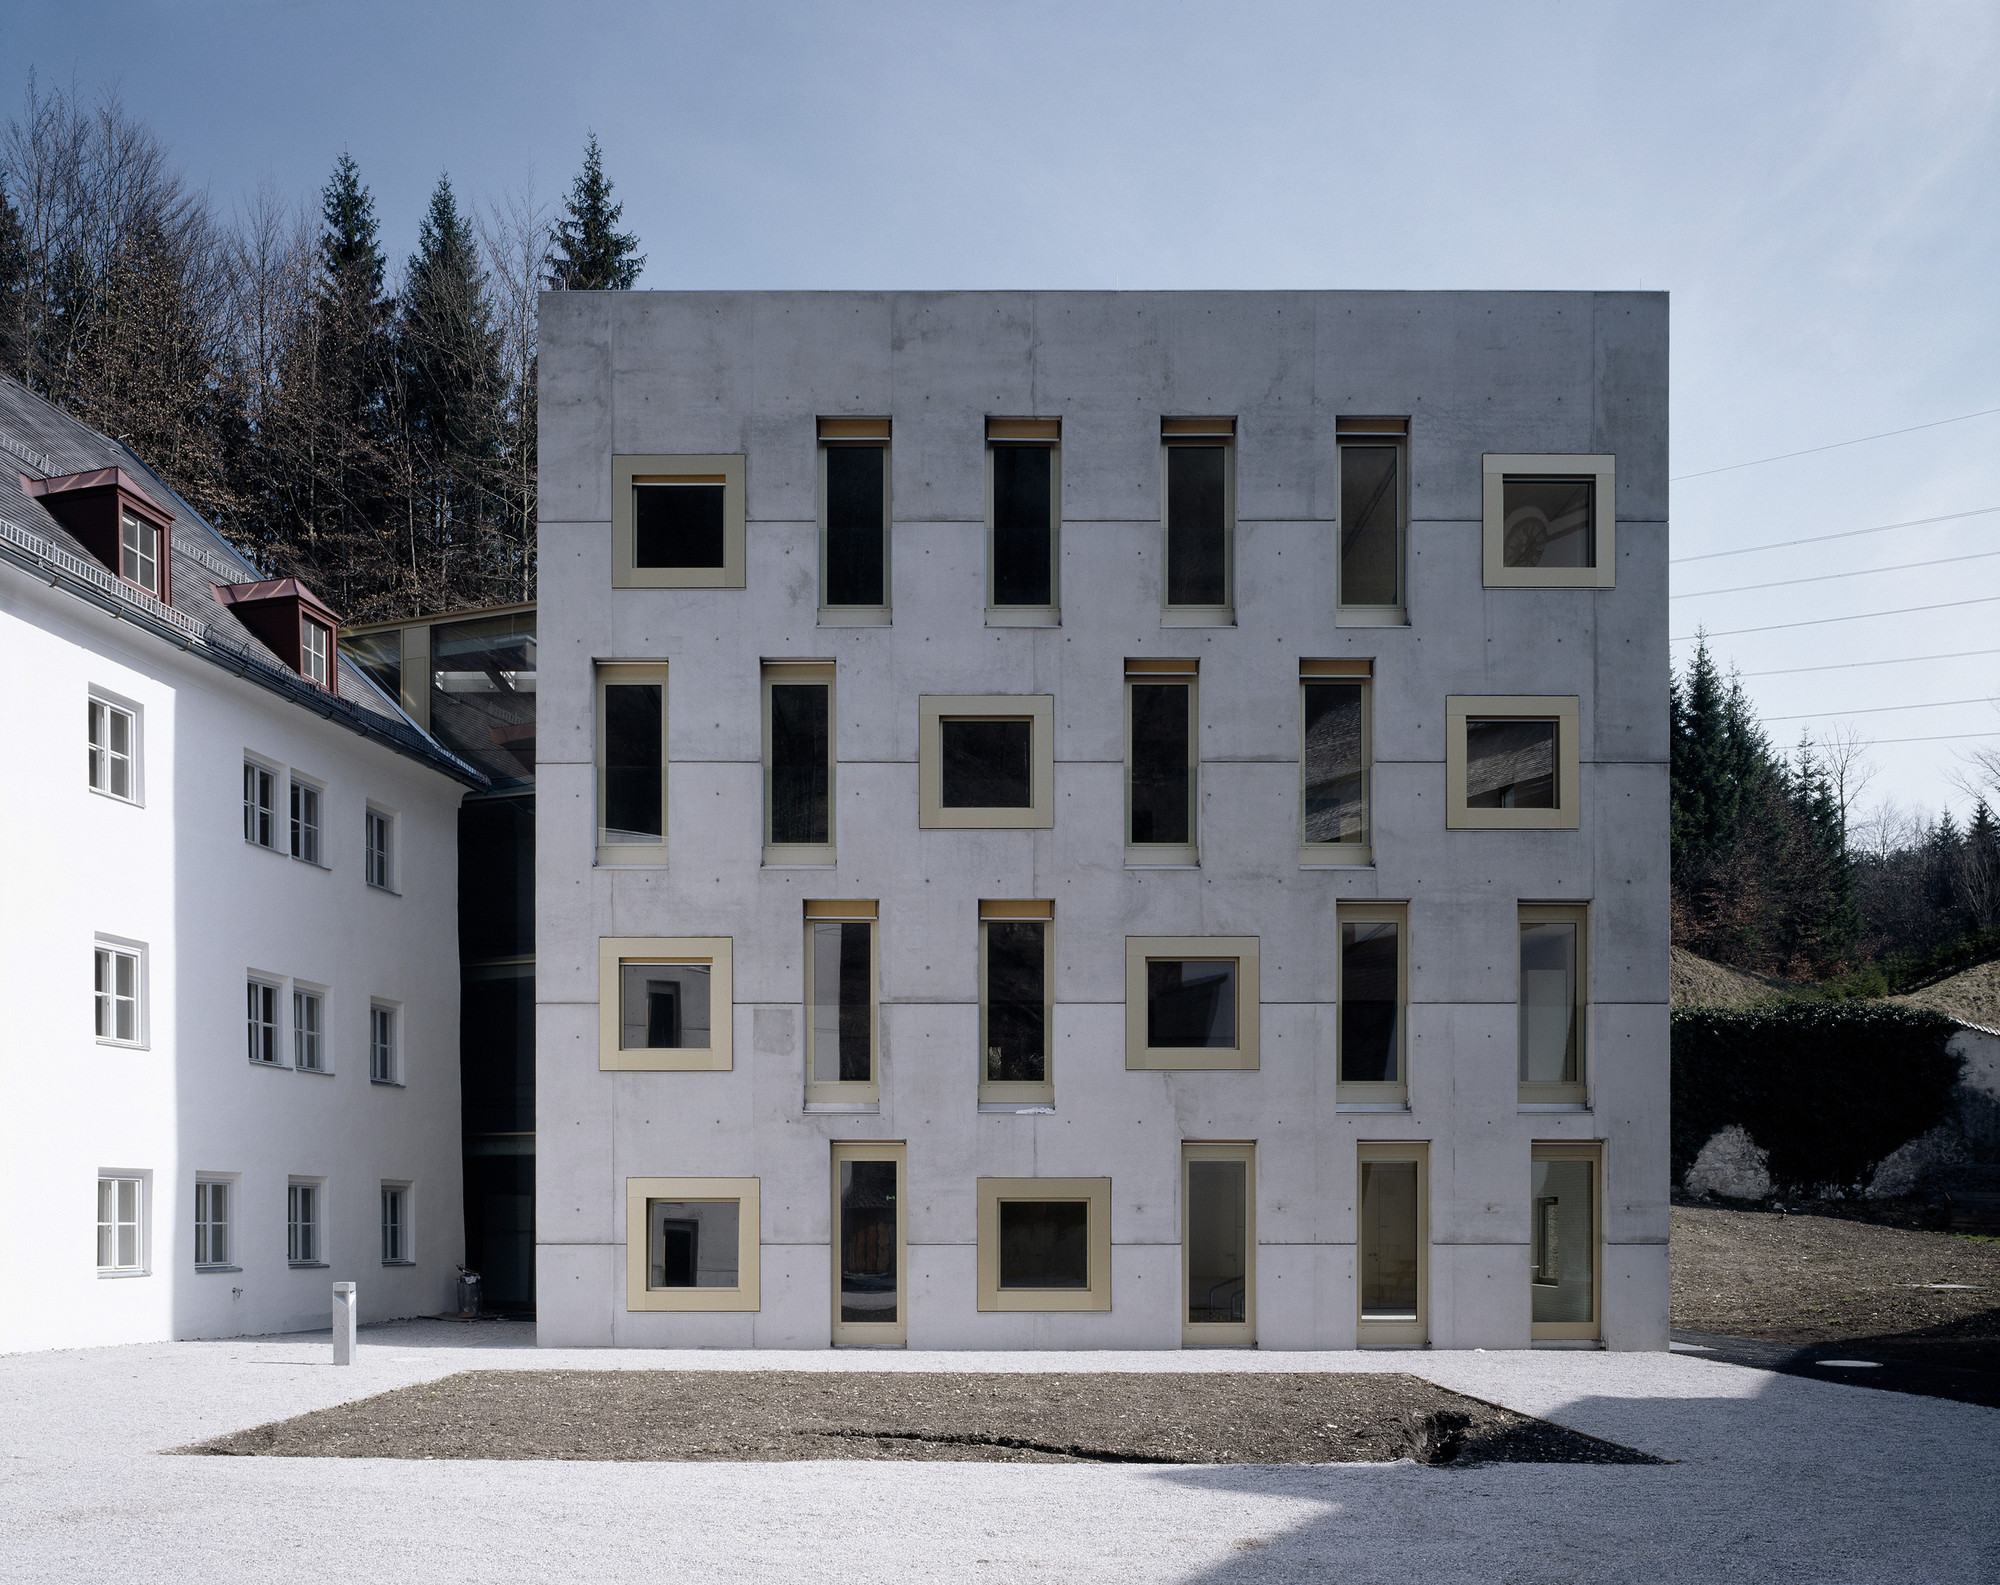 Special School and Dormitory Mariatal / Marte Marte Architects, © Bruno Klomfar